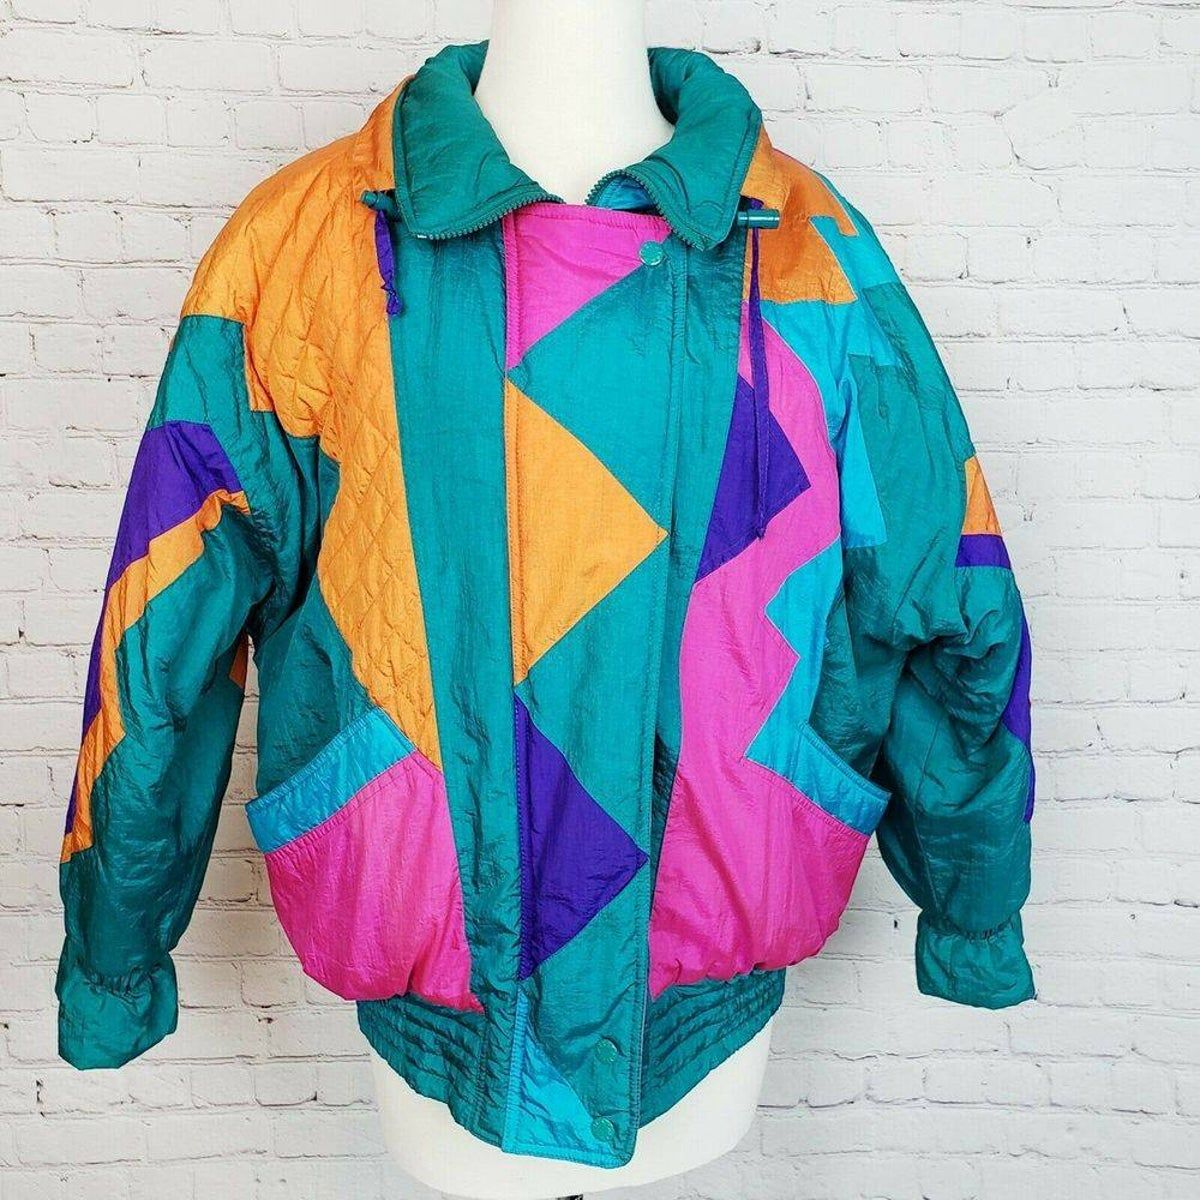 Vintage Izzi Ski Jacket 80s Retro On Mercari Ski Jacket Color Block Coats Jackets [ 1200 x 1200 Pixel ]